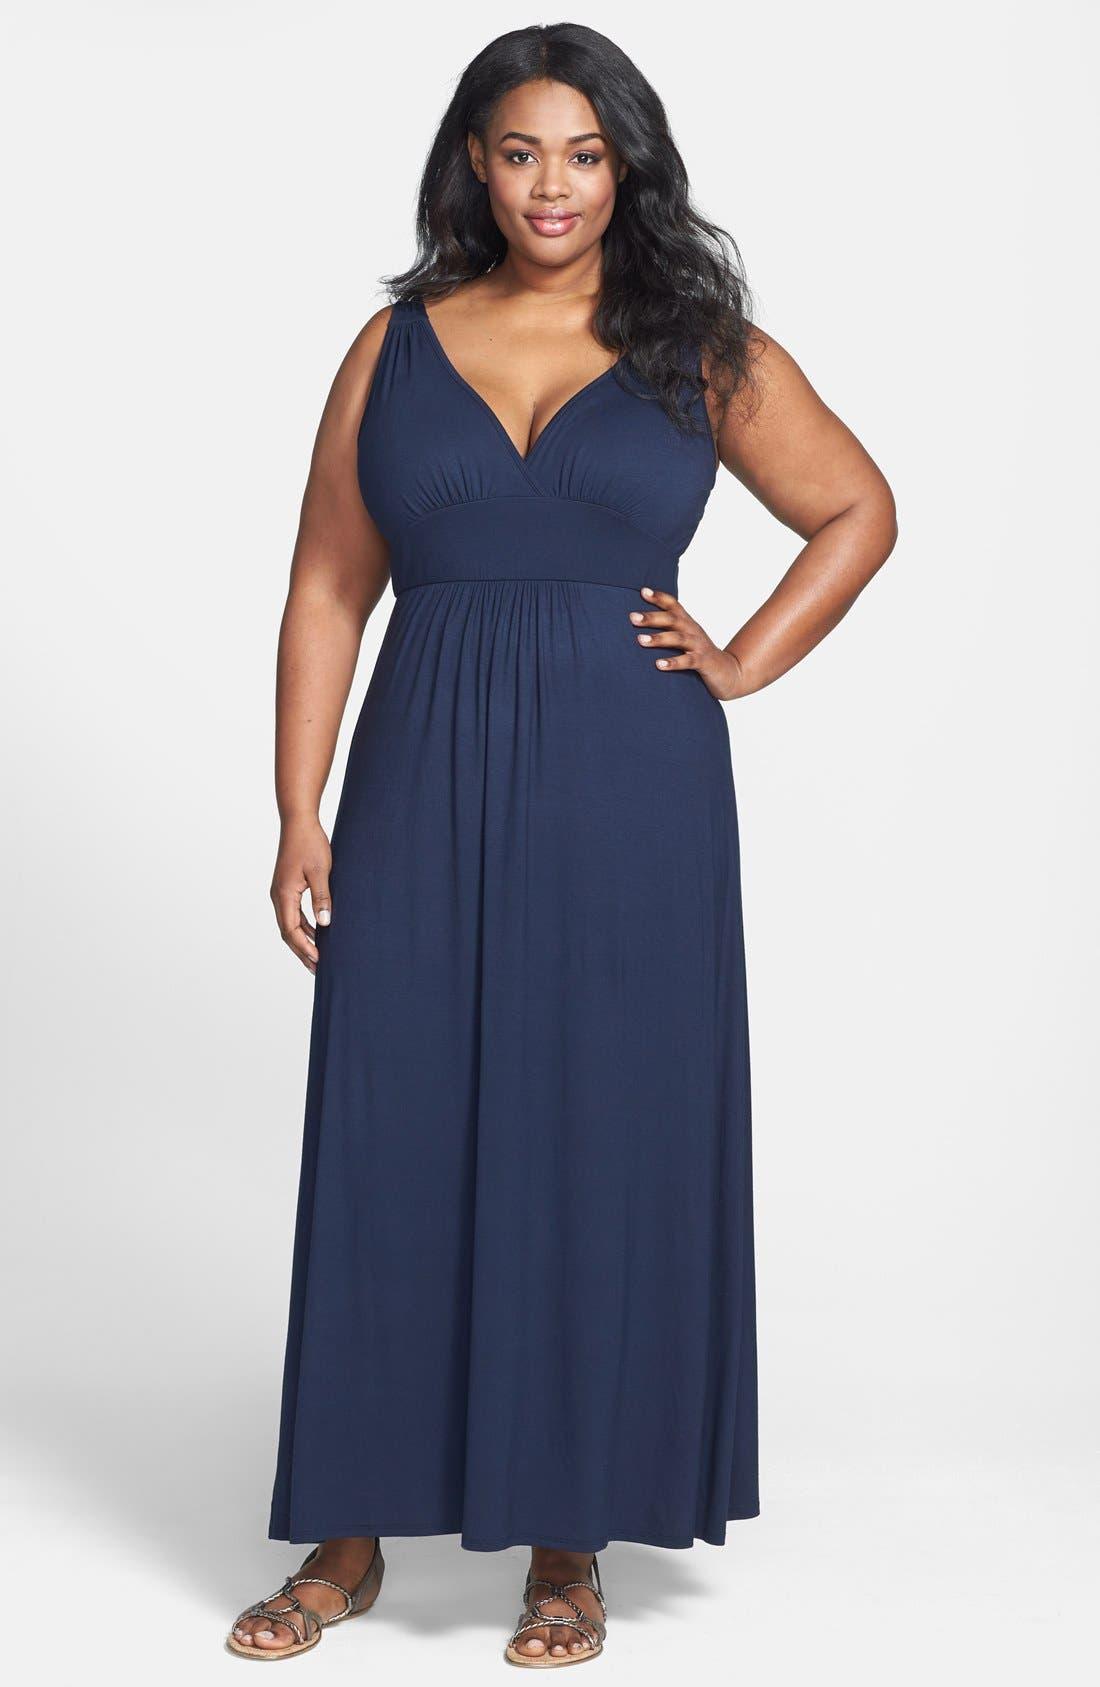 Alternate Image 1 Selected - Loveappella V-Neck Jersey Maxi Dress (Plus Size)